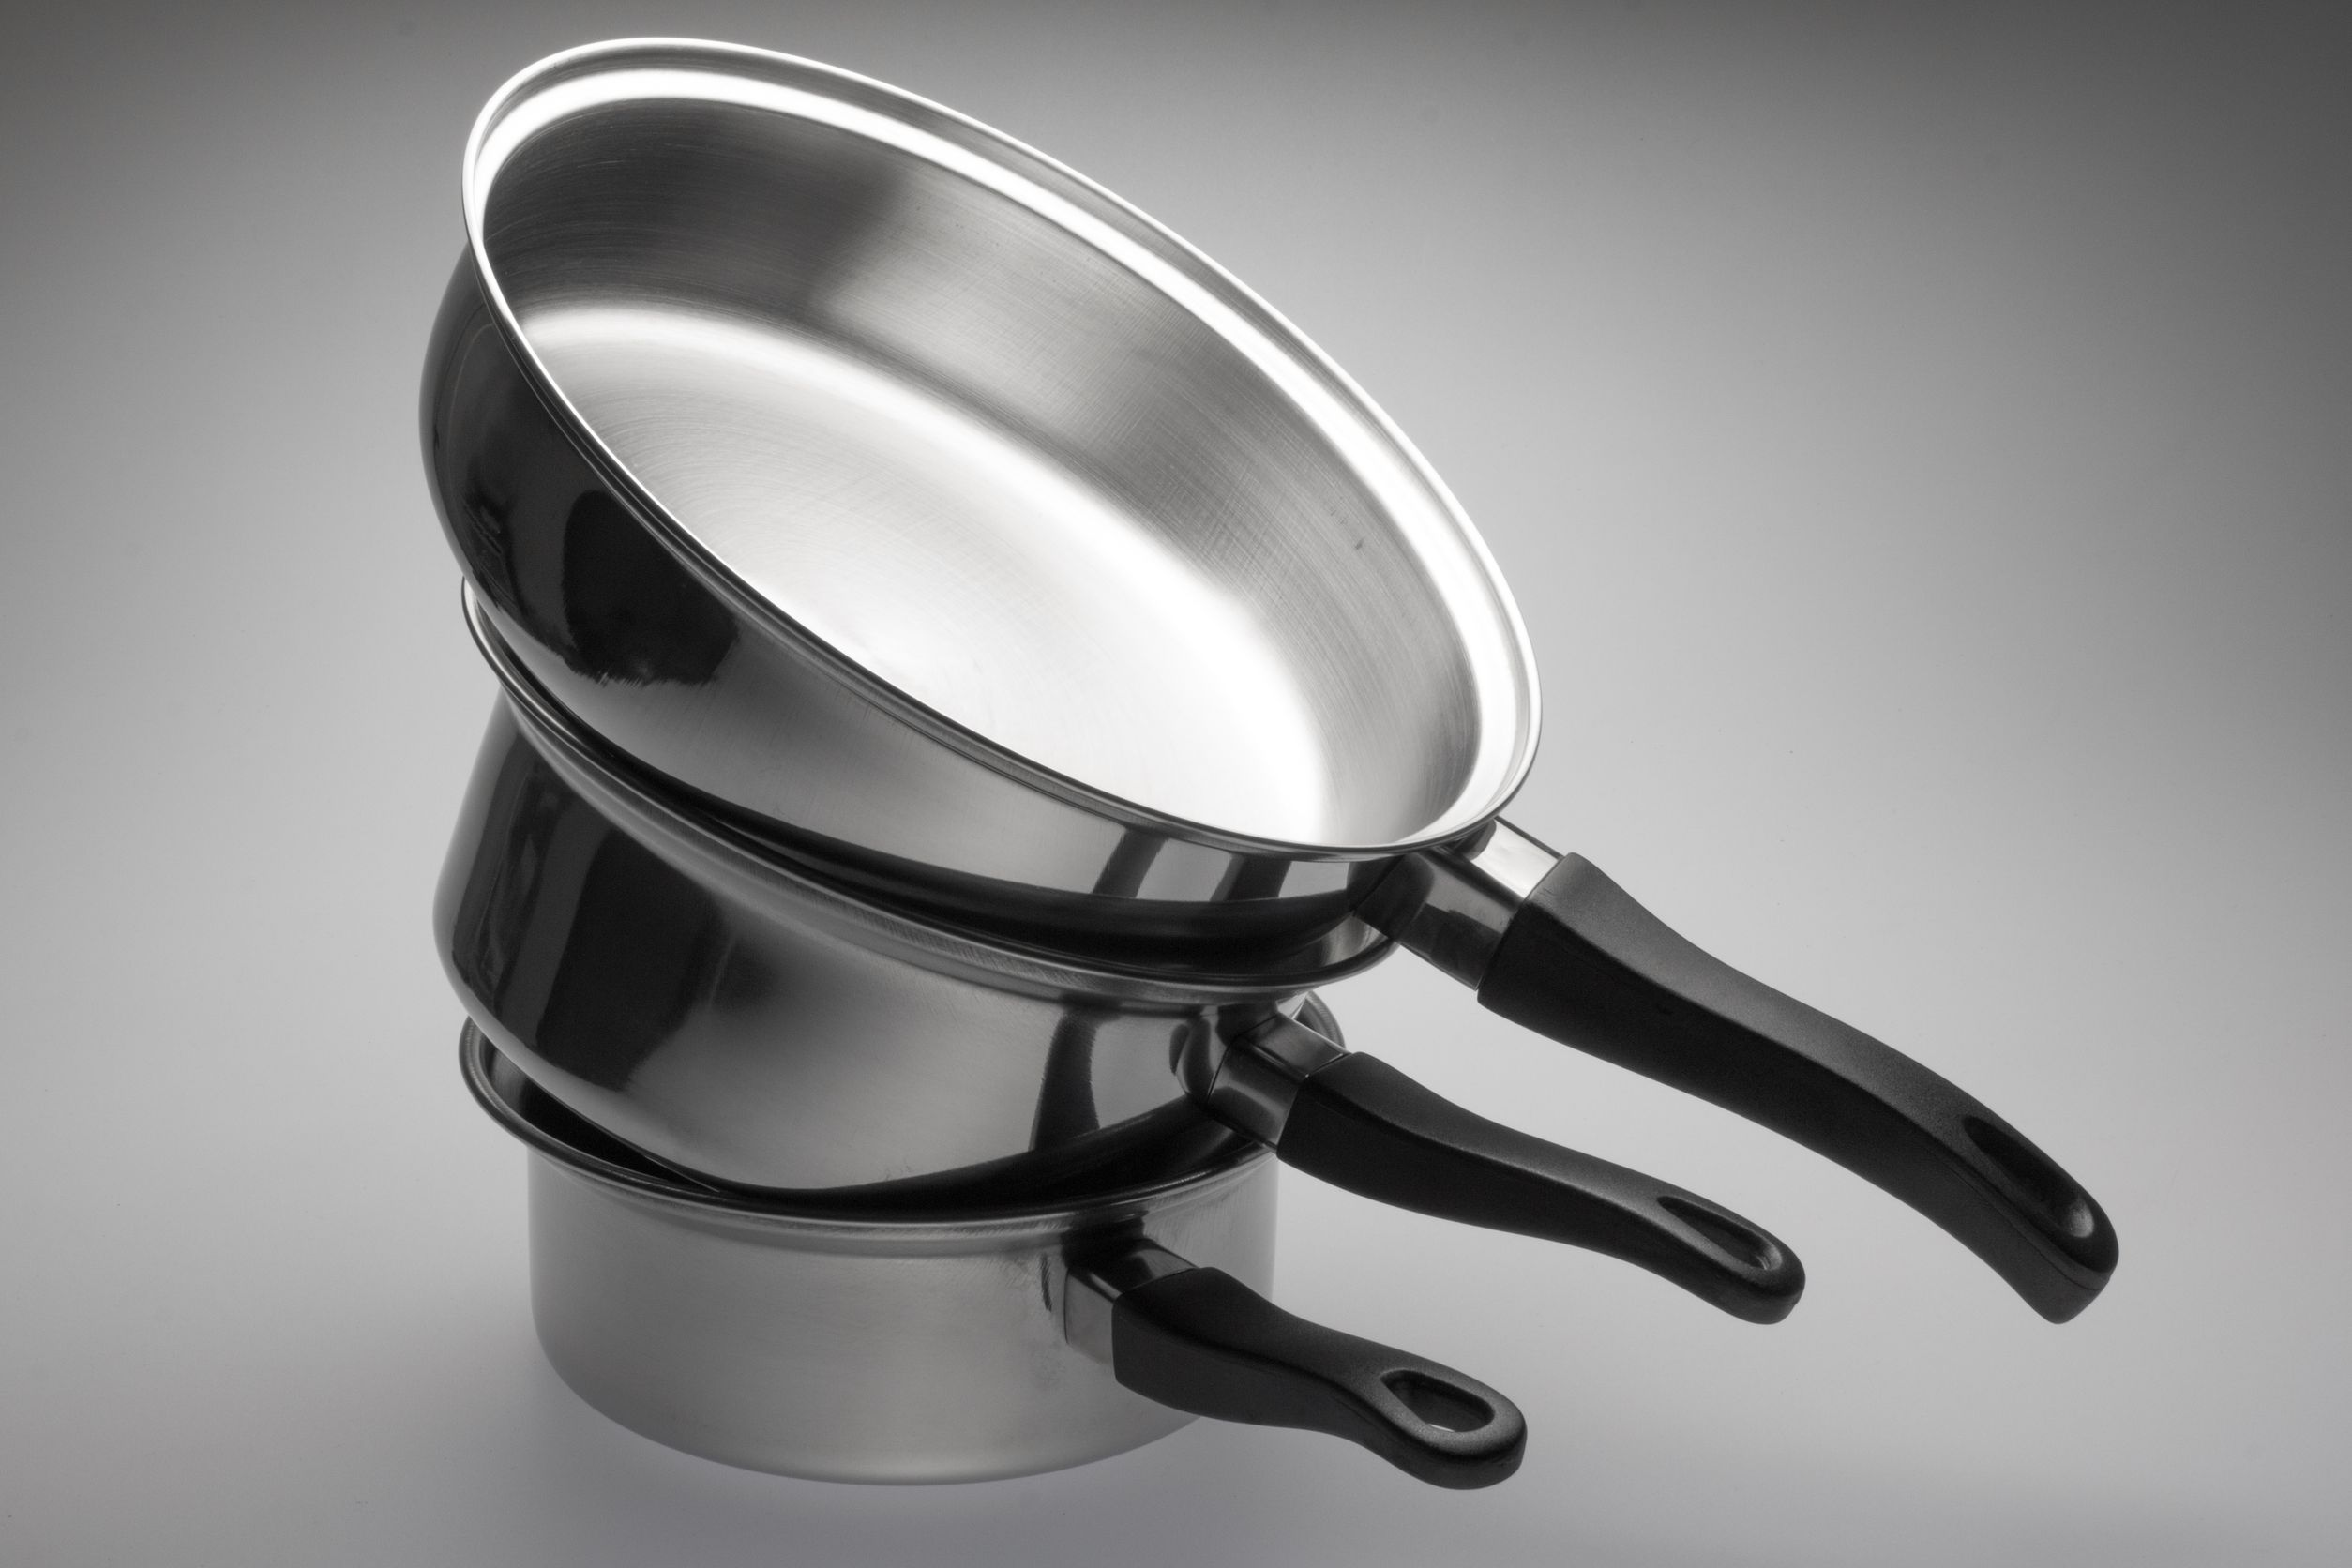 C mo limpiar metales senesant 2000 for Objetos para cocinar